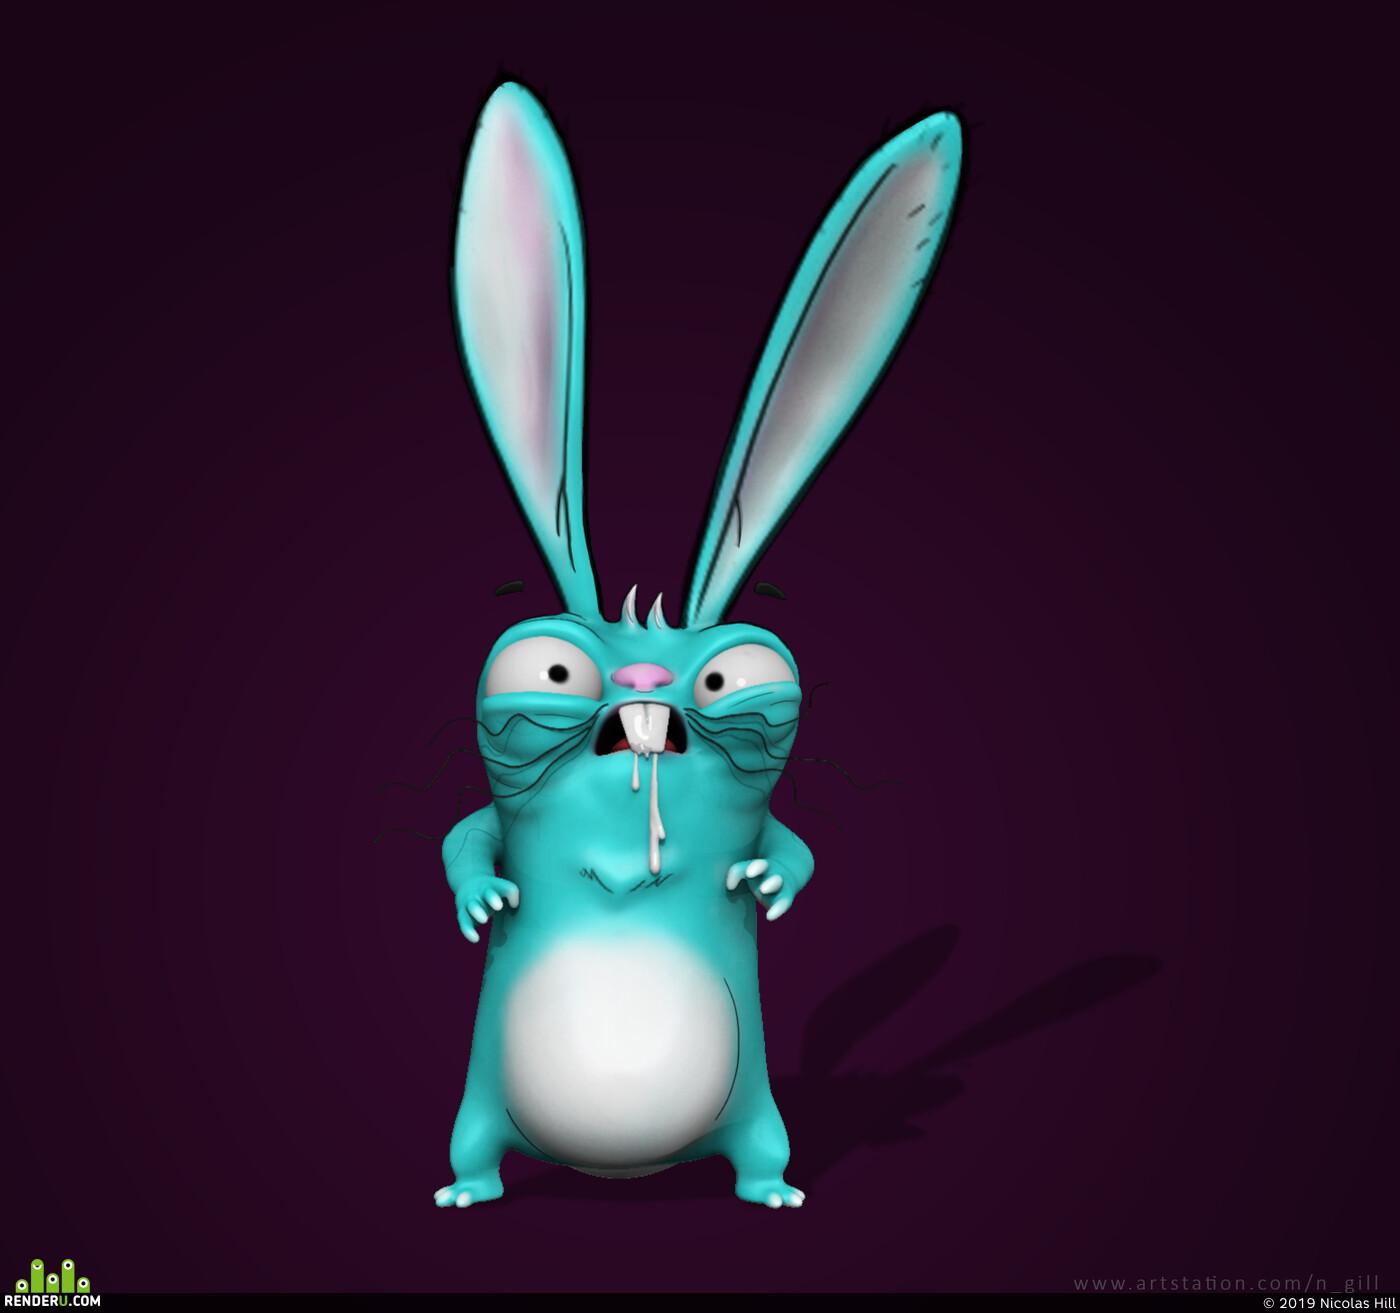 psycho, psychorabbit, funart, Characters characterdesign characterart, speed sculpt